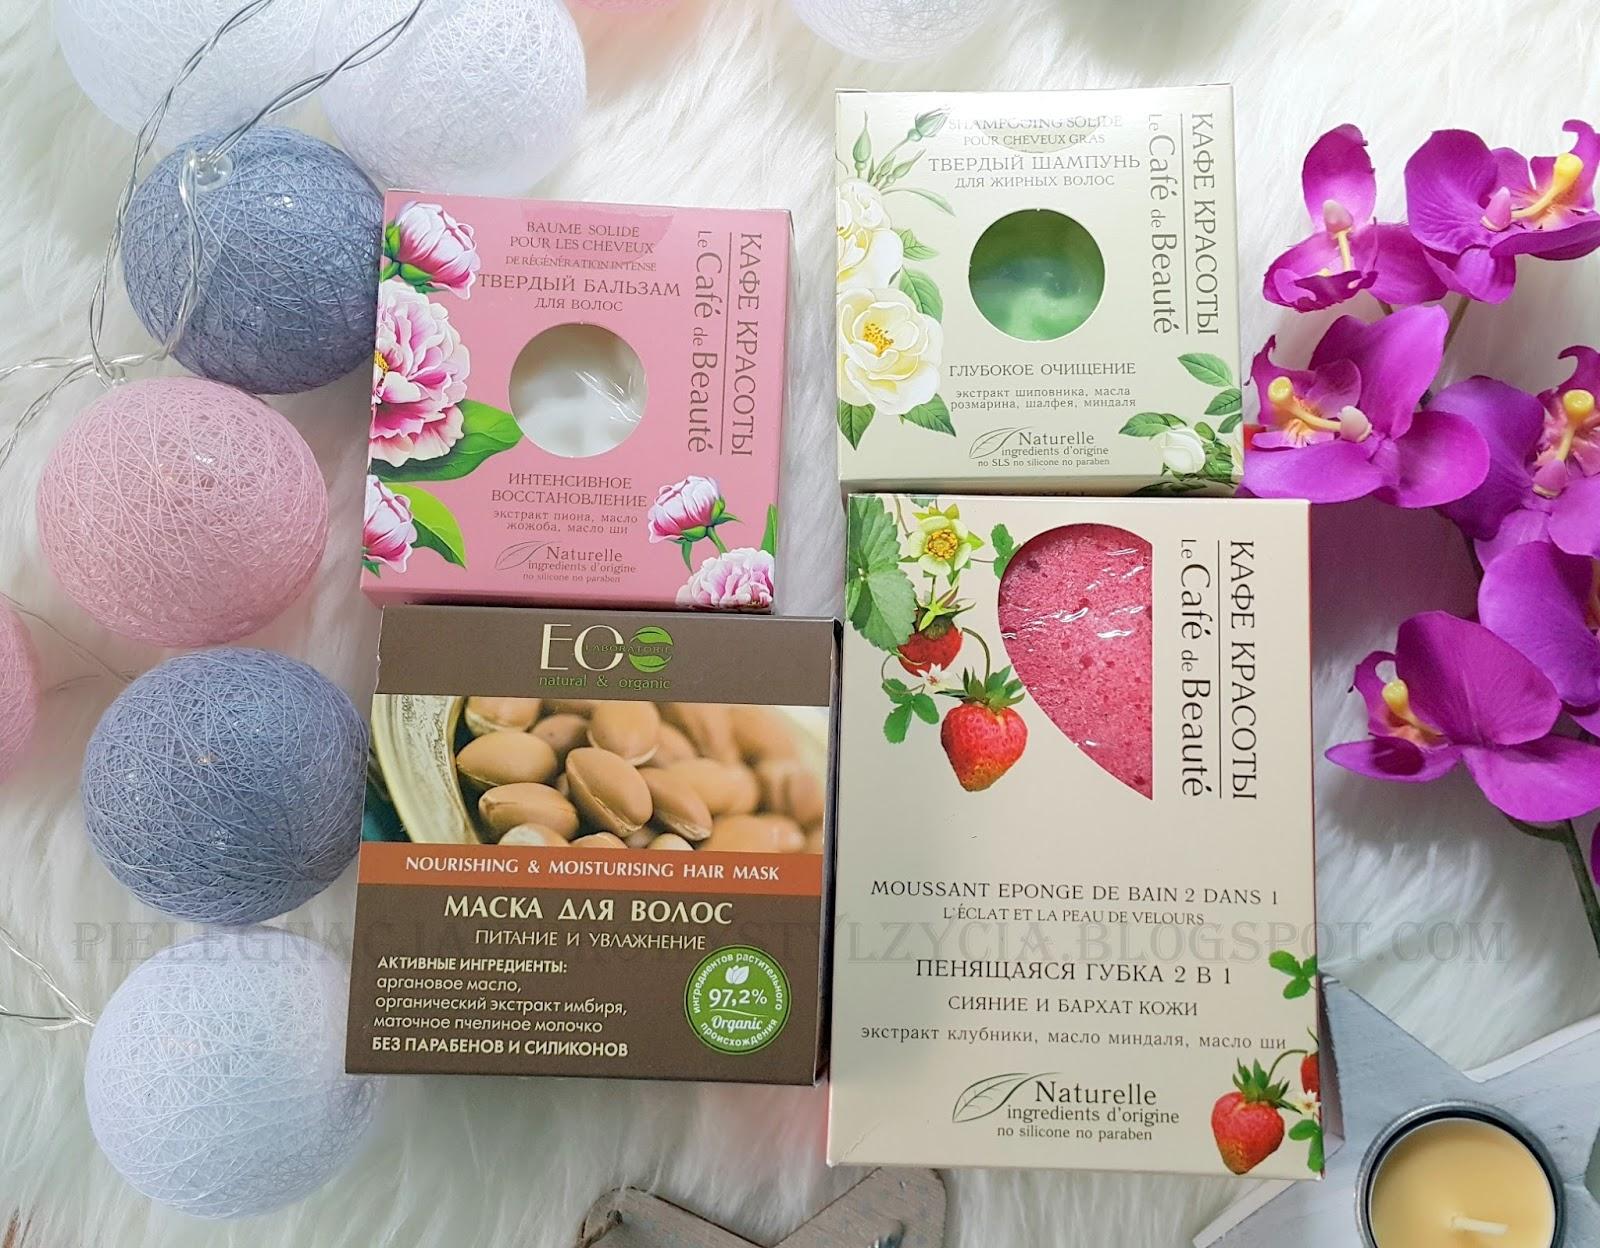 Zakupy - EC Lab, DR. KONOPKA'S, Le Cafe de Beaute, Planeta Organica | Naturalne kosmetyki